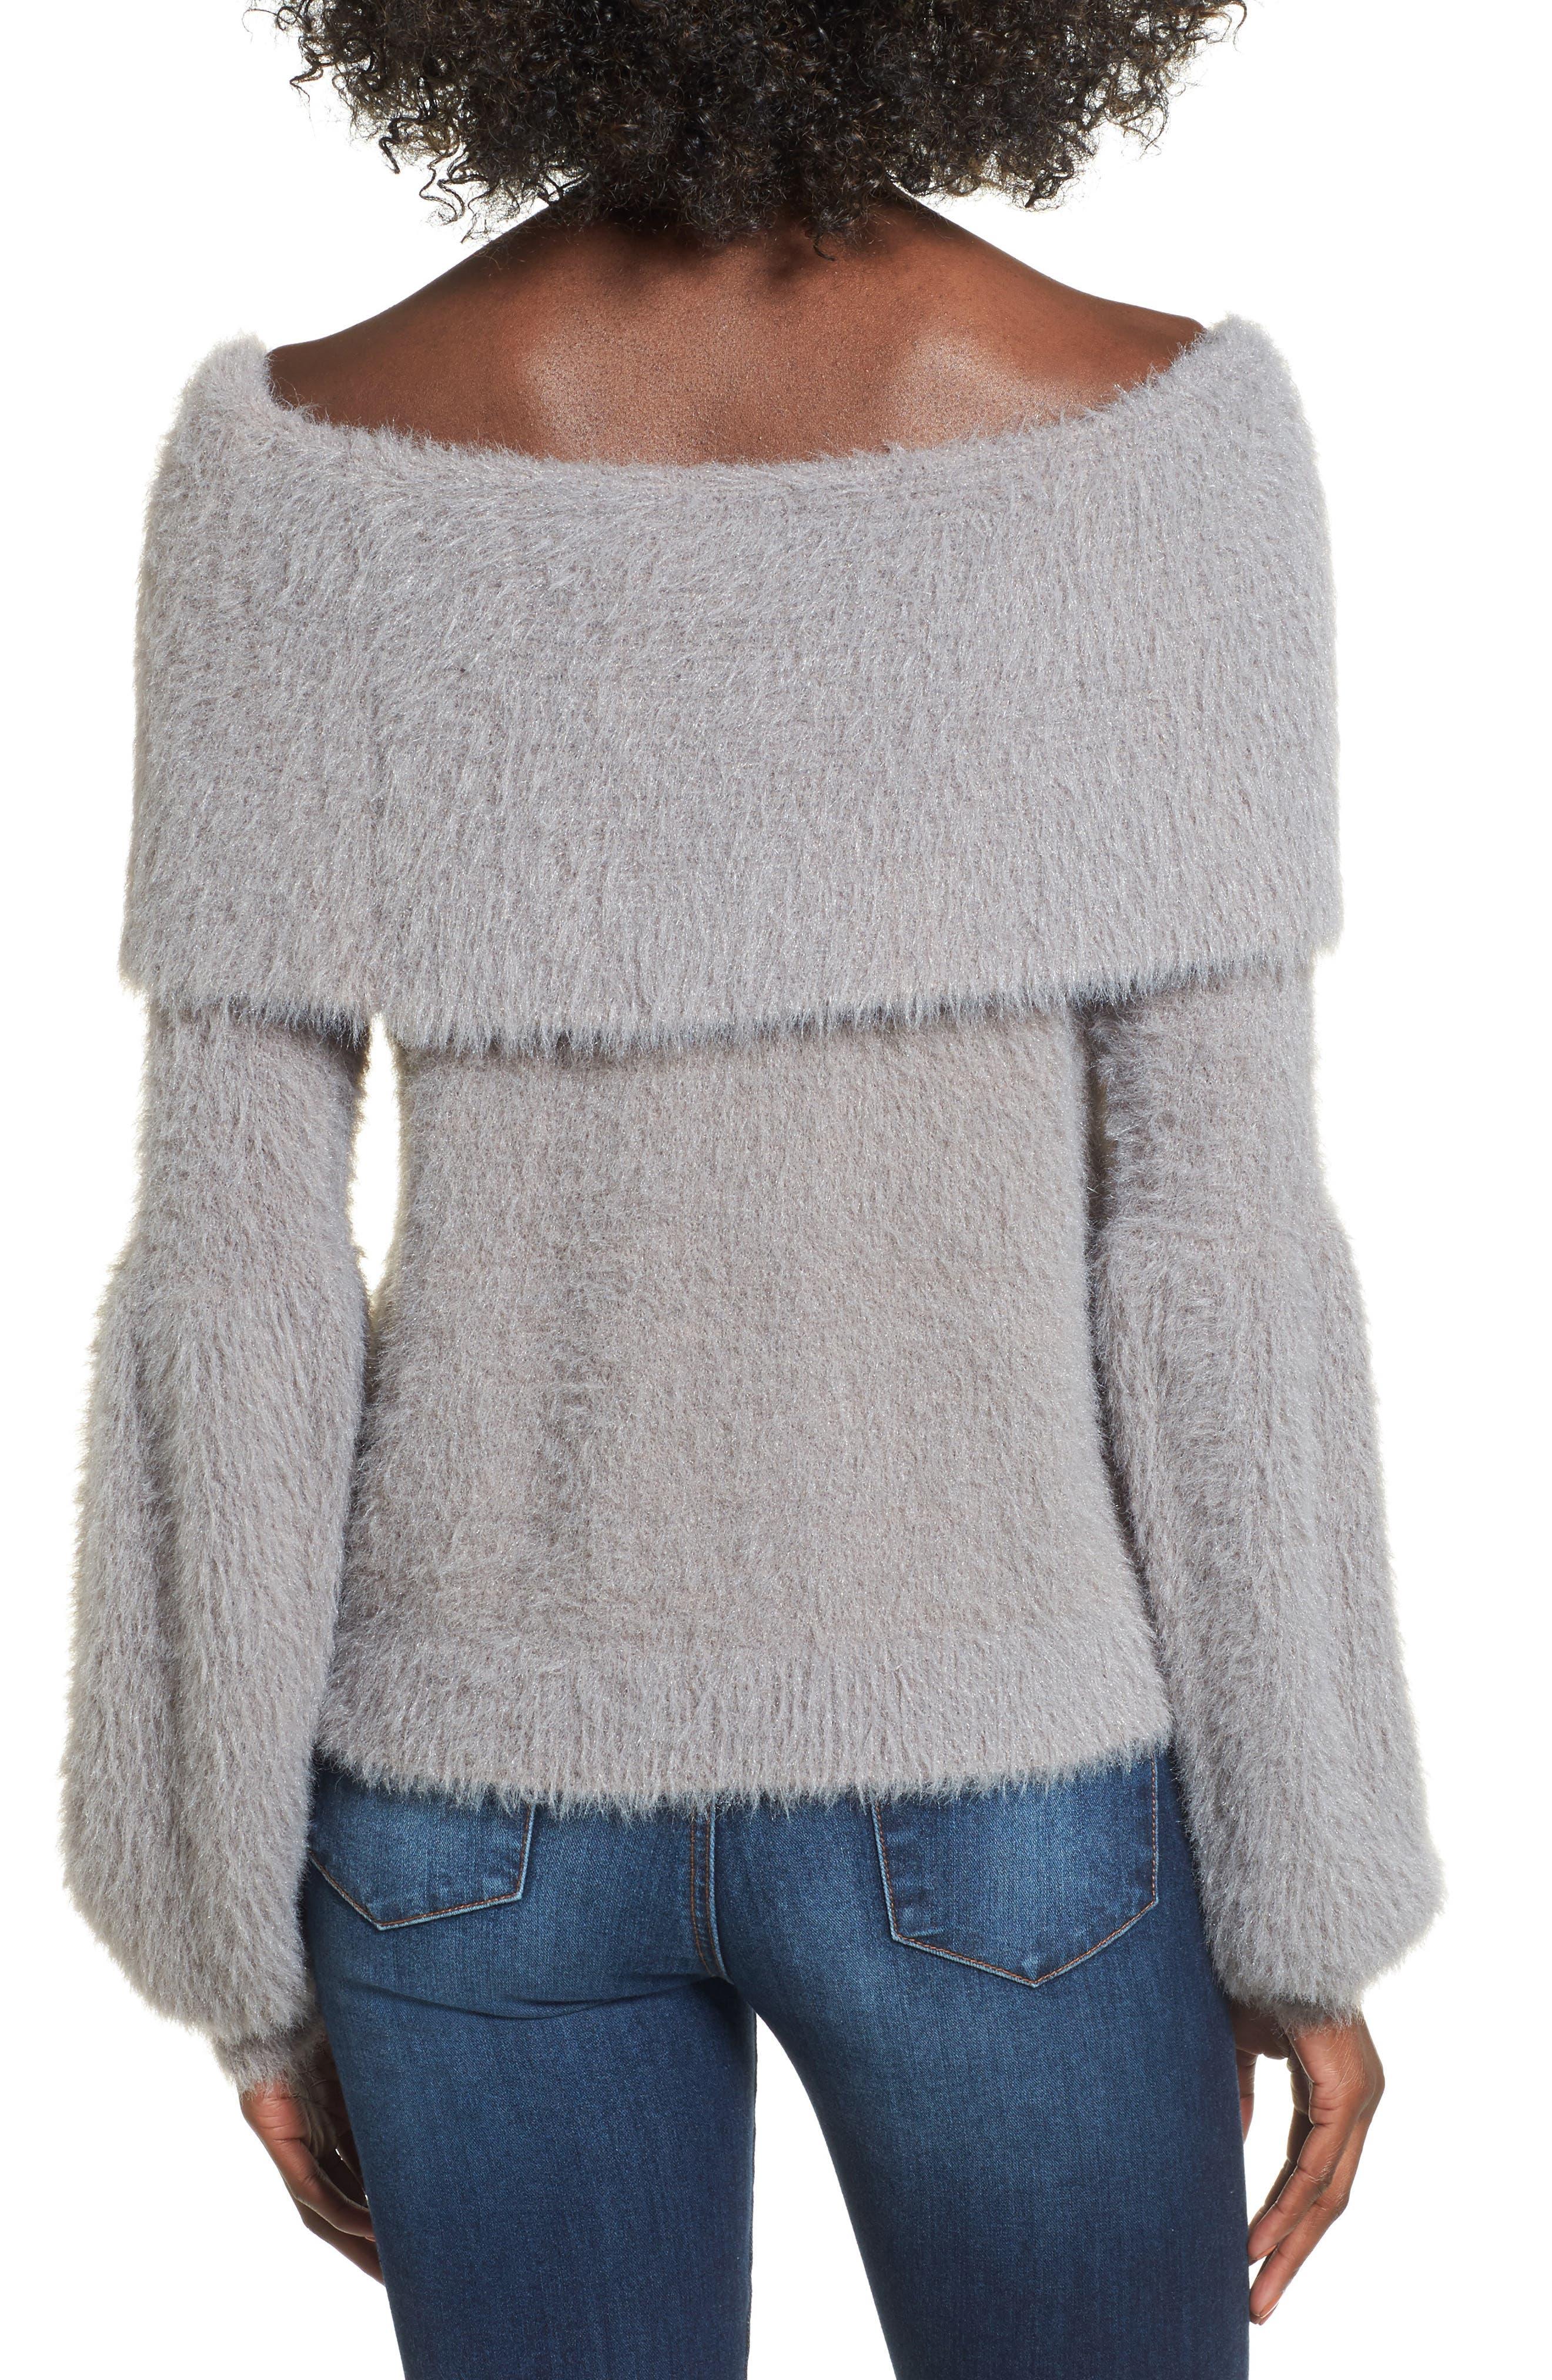 Off the Shoulder Sweater,                             Alternate thumbnail 2, color,                             Grey Cloudburst